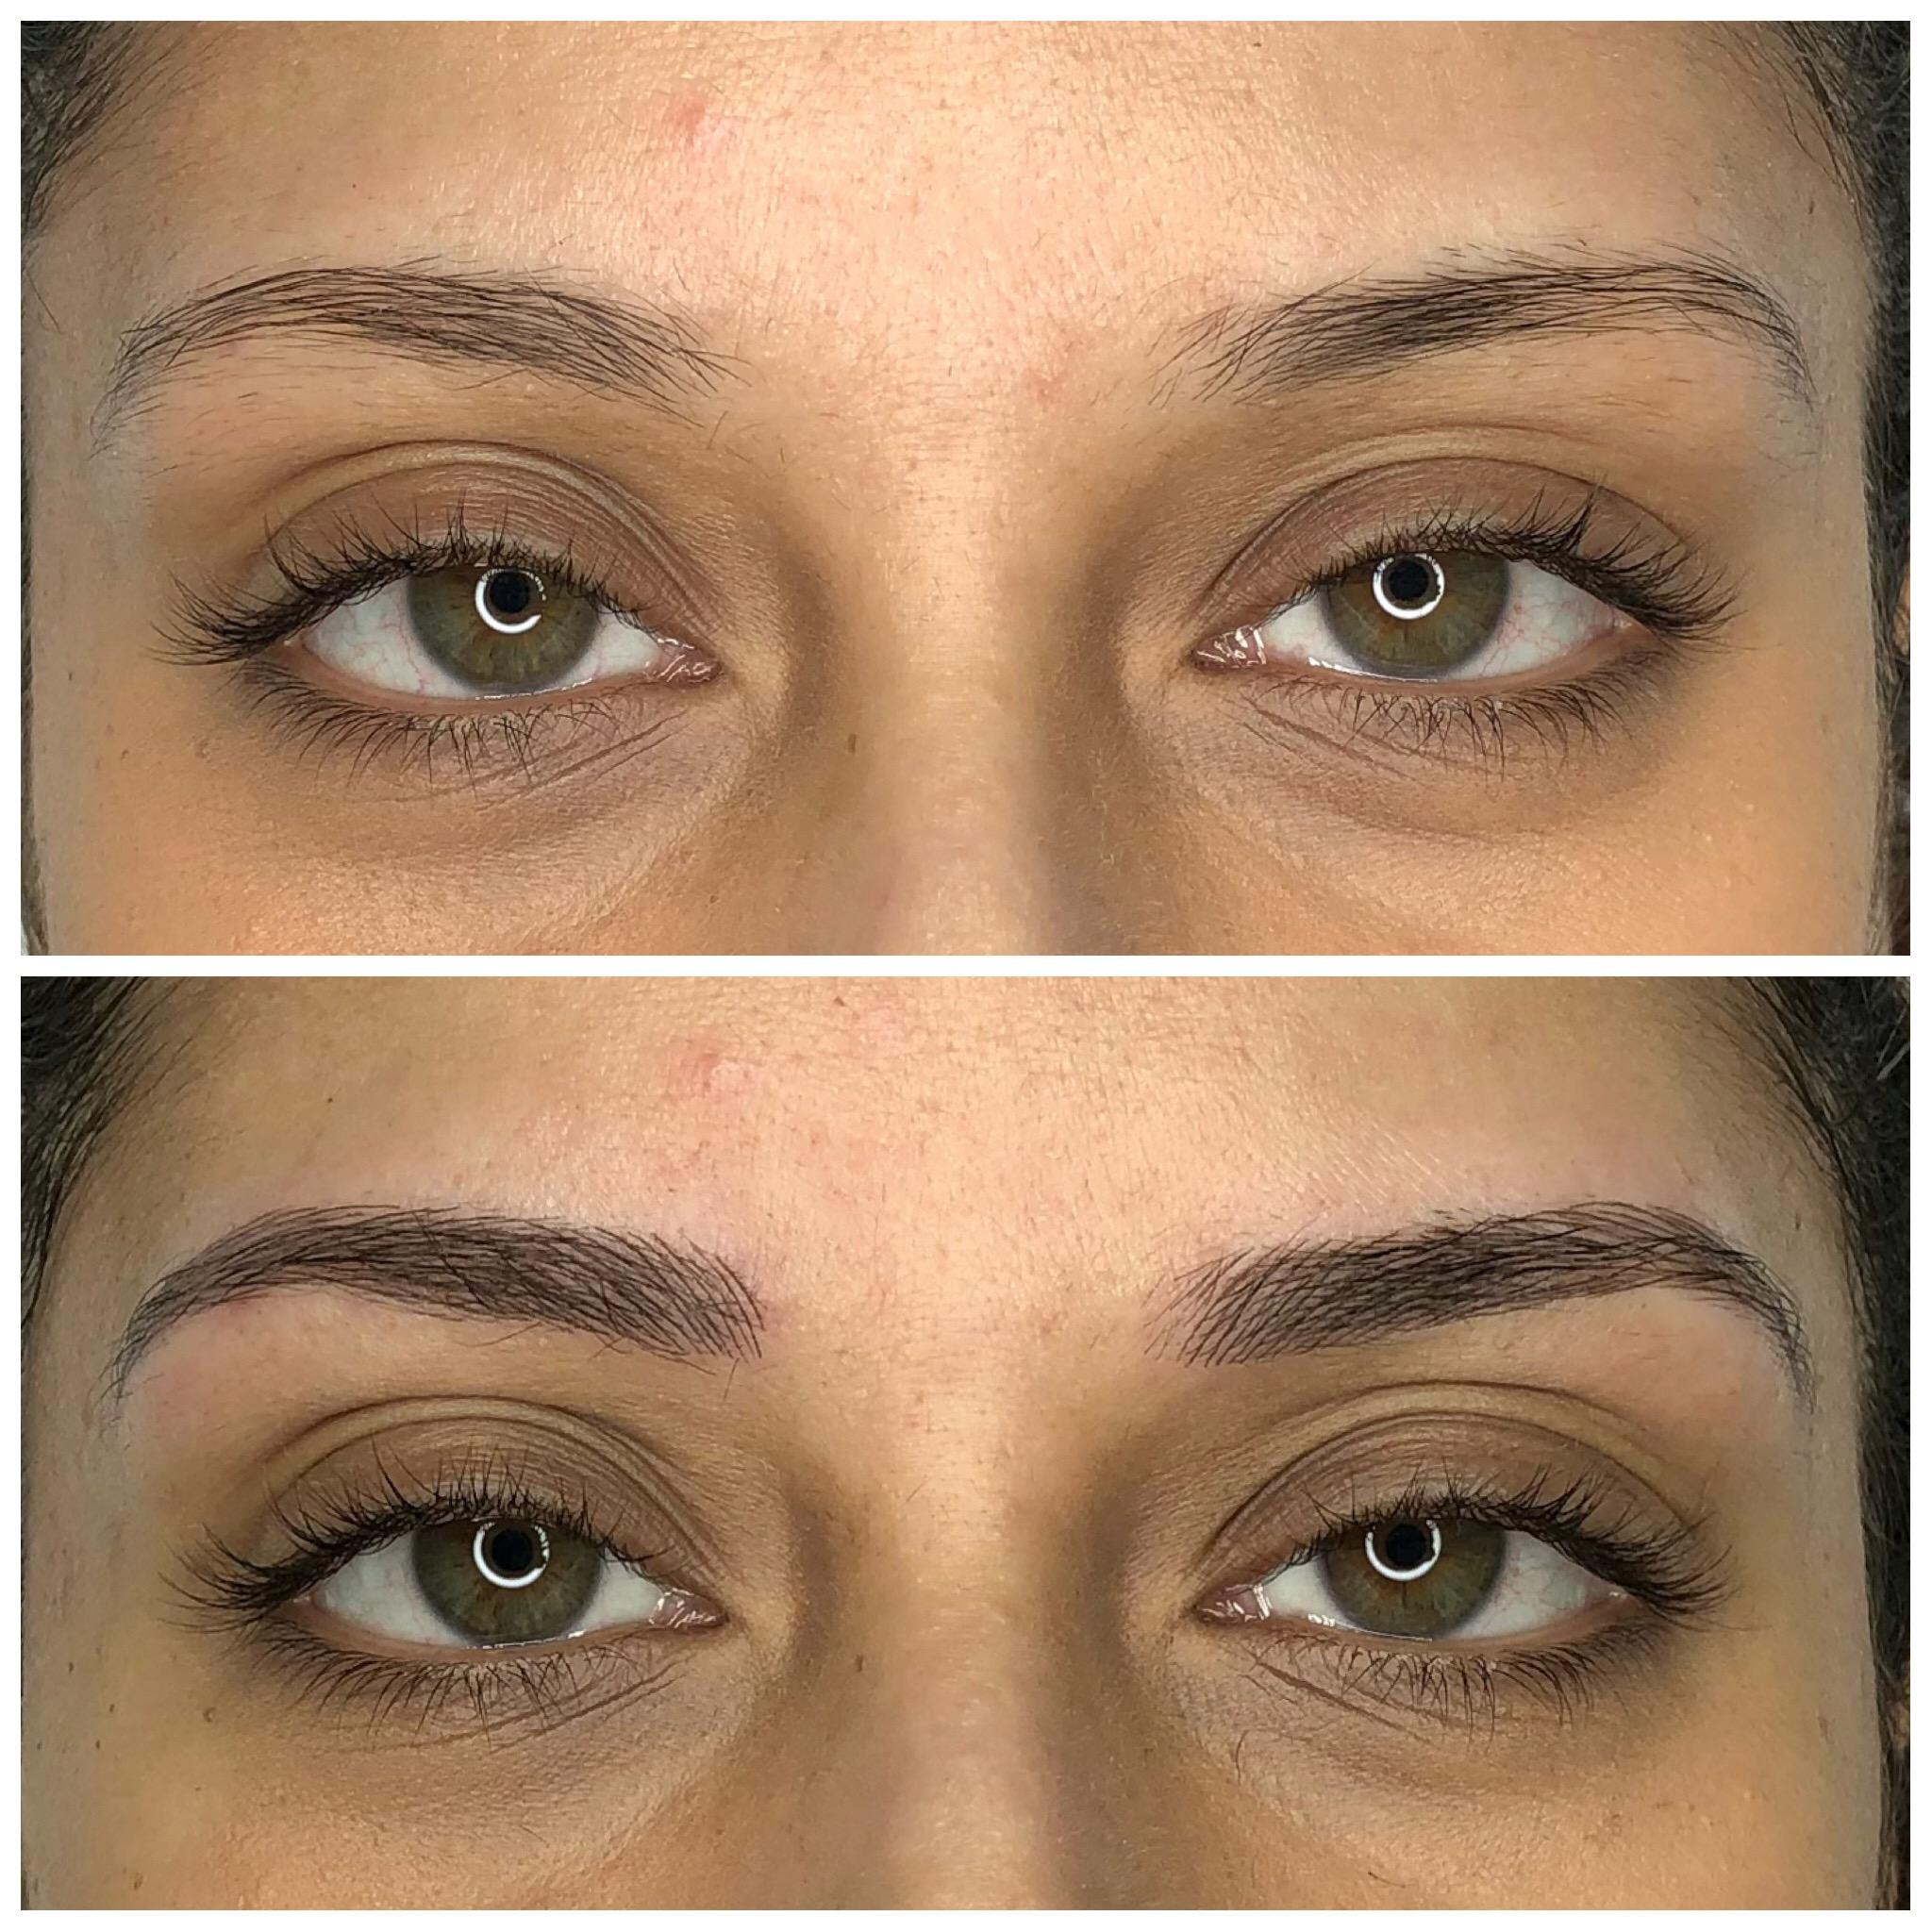 Microblading Eyebrows Near Me - Shumailas London Beauty Salons